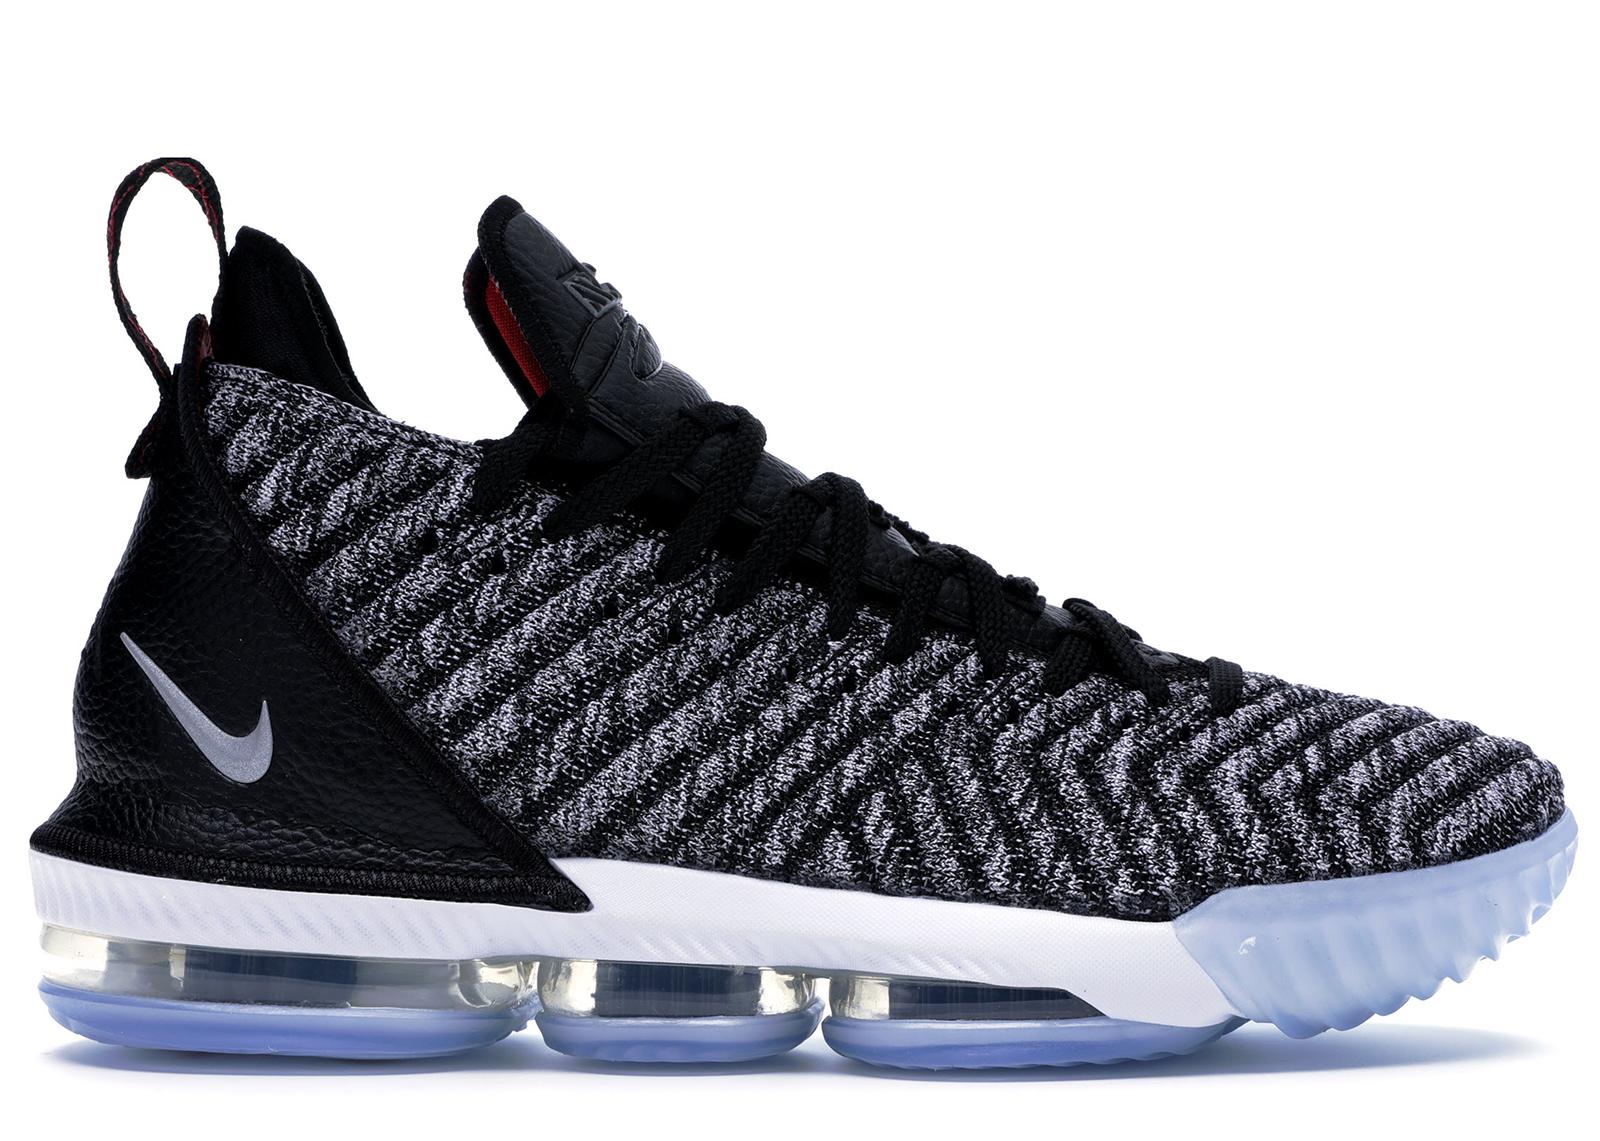 Nike LeBron 16 Oreo - AO2588-006/AO2595-006